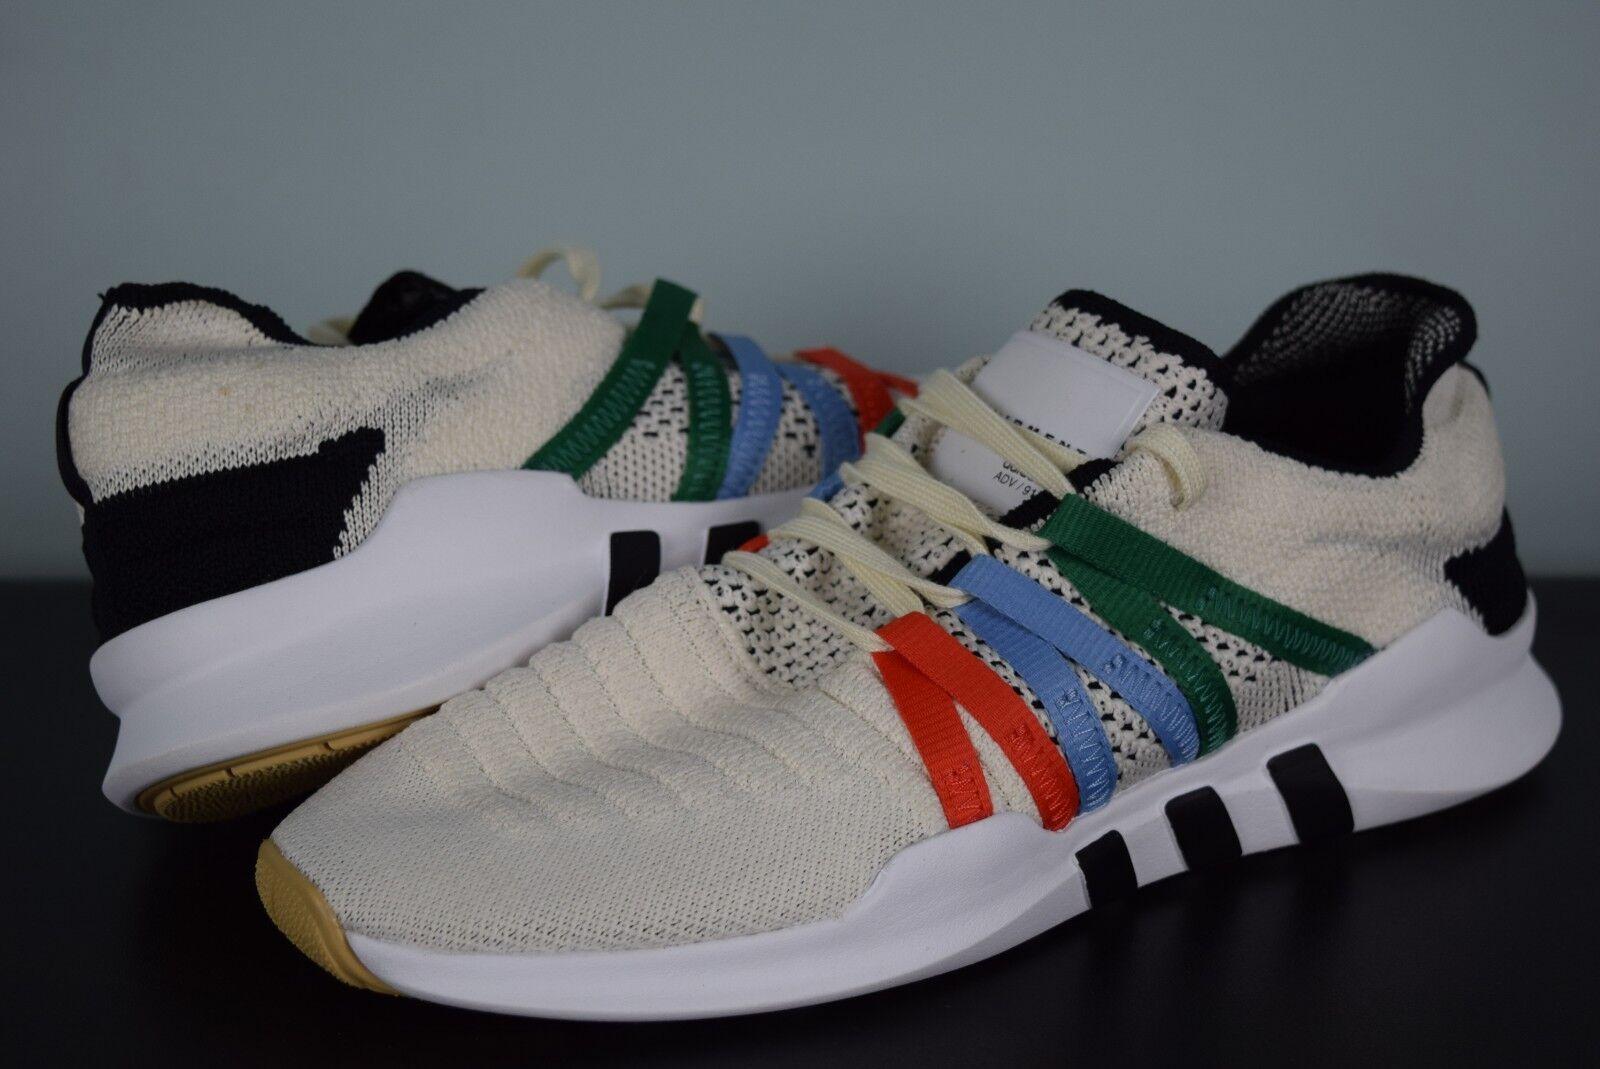 New Womens Adidas Originals EQT Racing ADV PrimeKnit CQ2239 sz 9 white cream